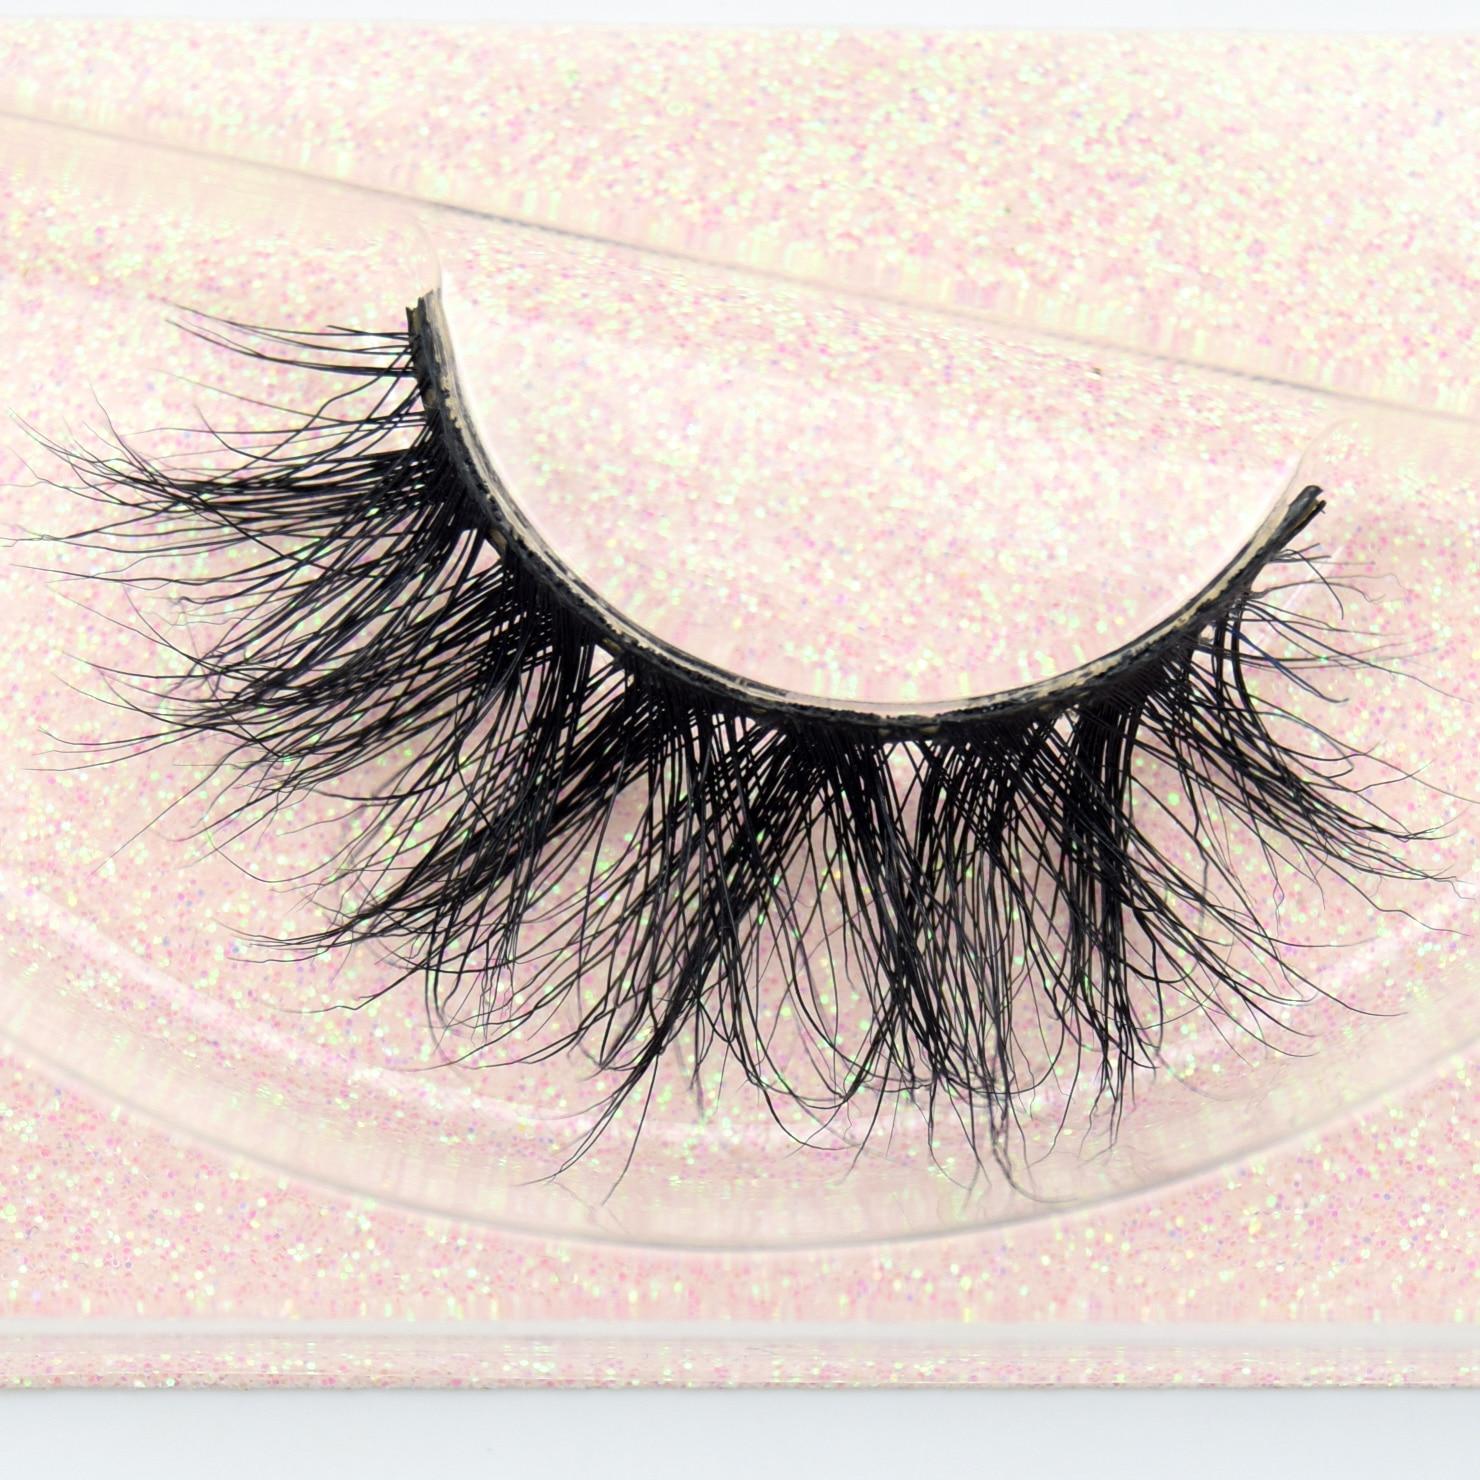 a5238332a4b SEXYSHEEP 1/2 Pairs Natural False Eyelashes Fake Lashes Long Makeup 3d Mink  Lashes Eyelash Extension Mink Eyelashes For Beauty